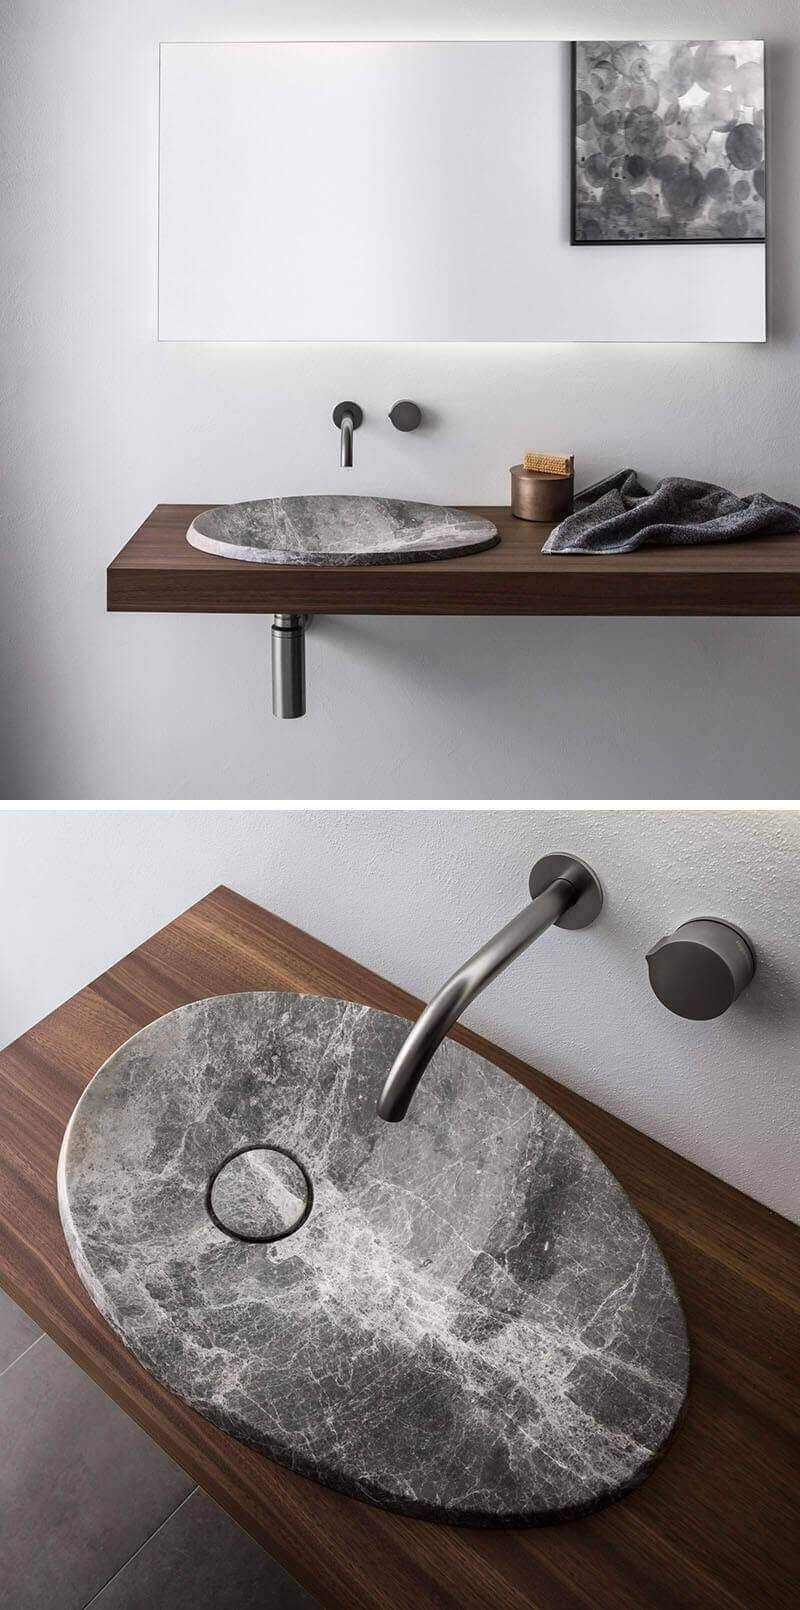 Stone Sinks Best Bathroom Sink Ideas Designs Unique Bathroom